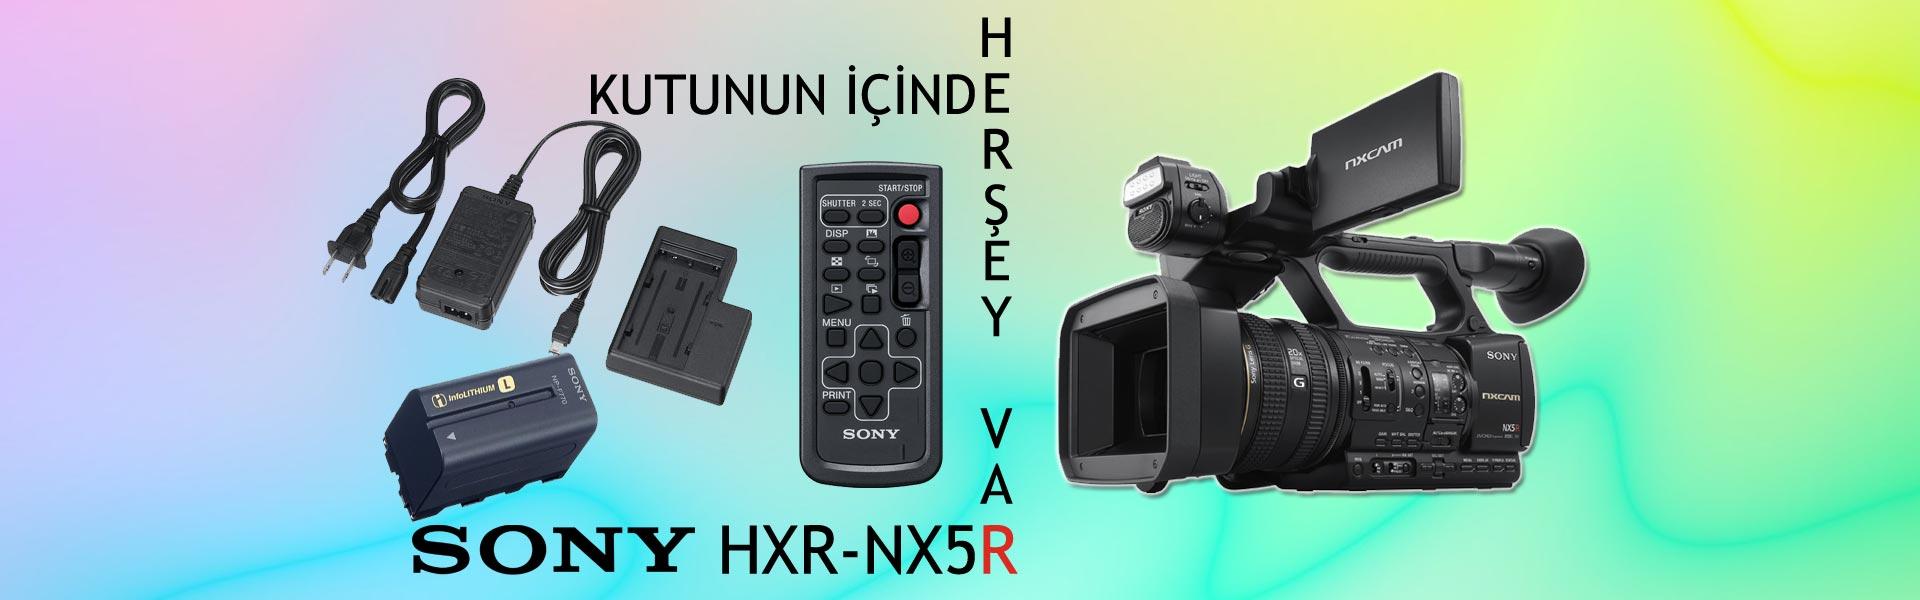 SONY-NX5R-KUTUslider